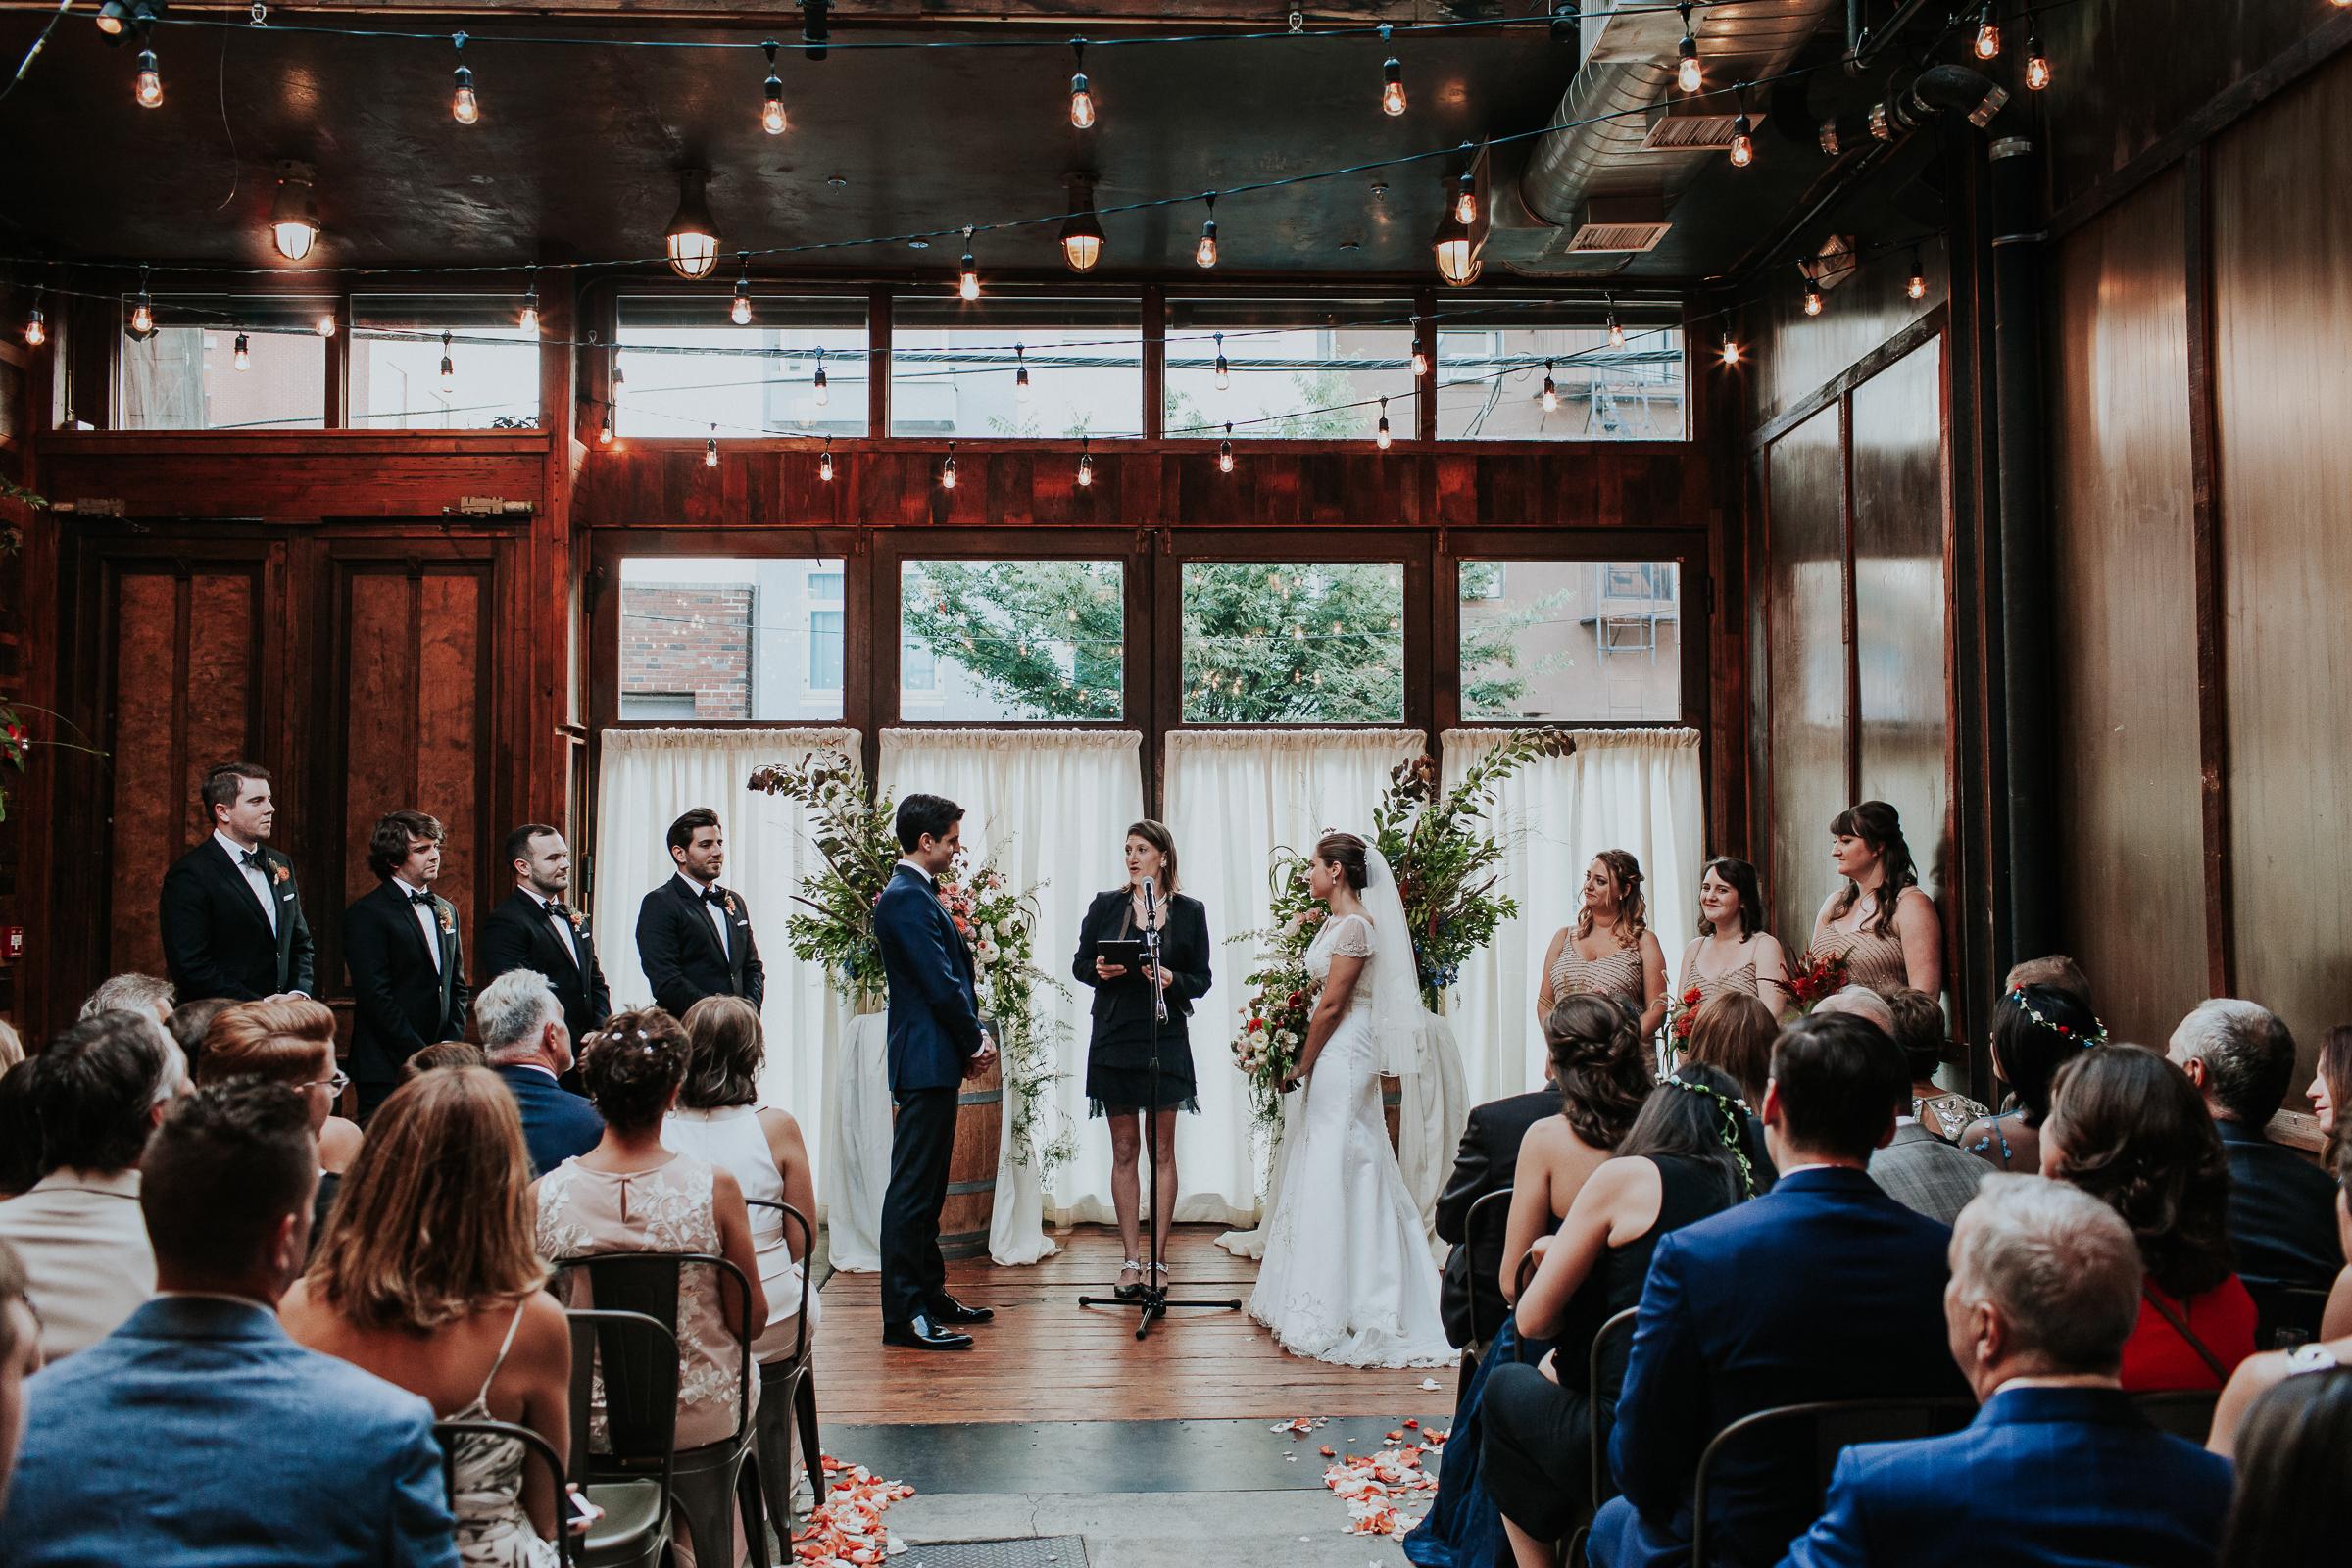 Brooklyn-Winery-NYC-Editorial-Documentary-Wedding-Photographer-Gina-Oli-75.jpg